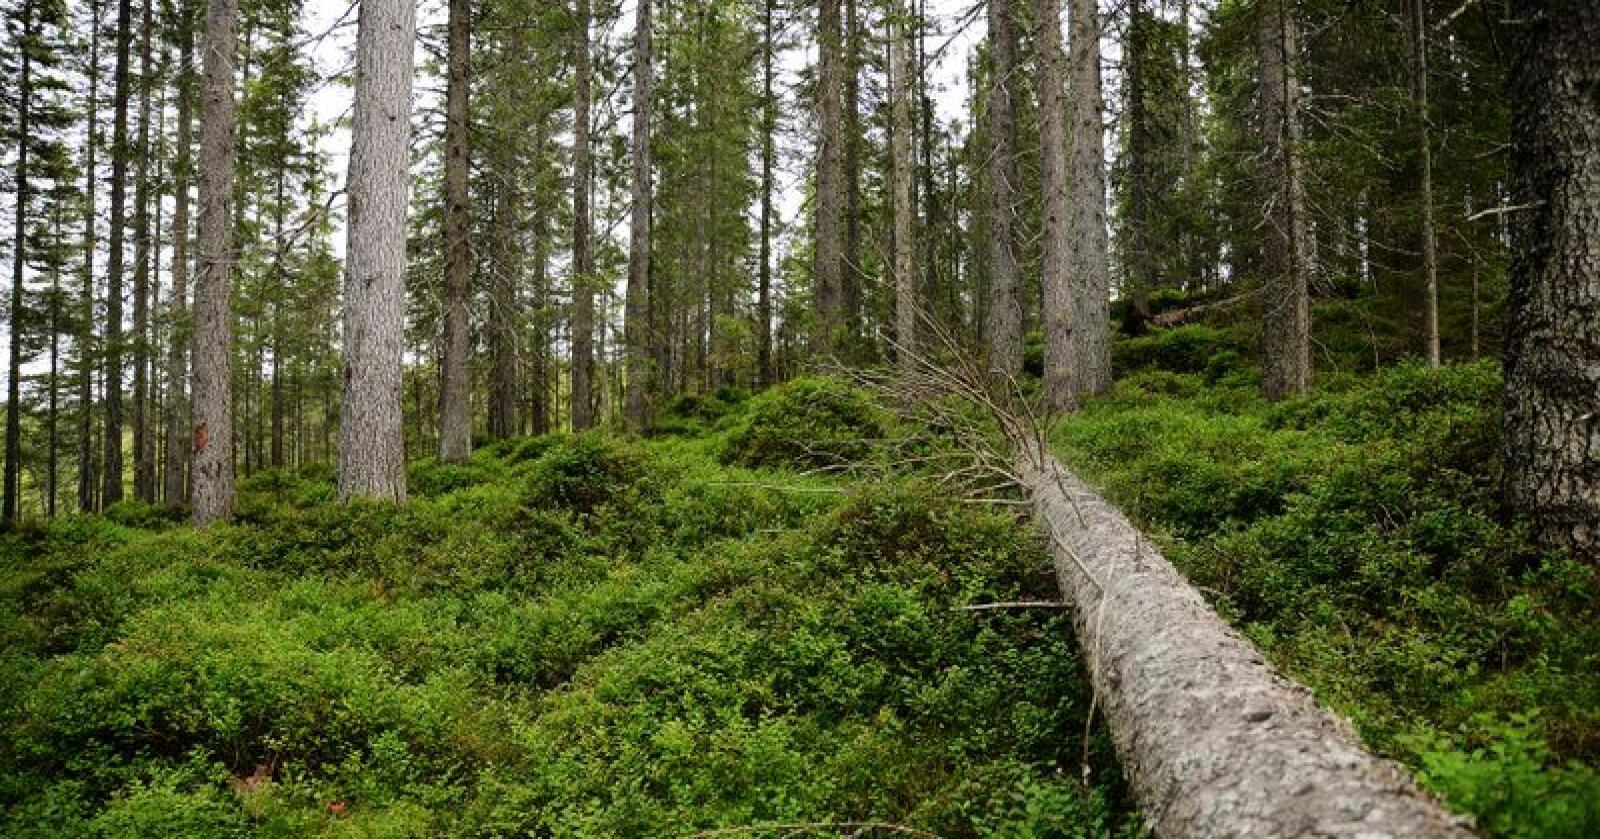 Hogstmoden: Klimaet trenger skogbruk, skriver innsenderen. Foto: Siri Juell Rasmussen